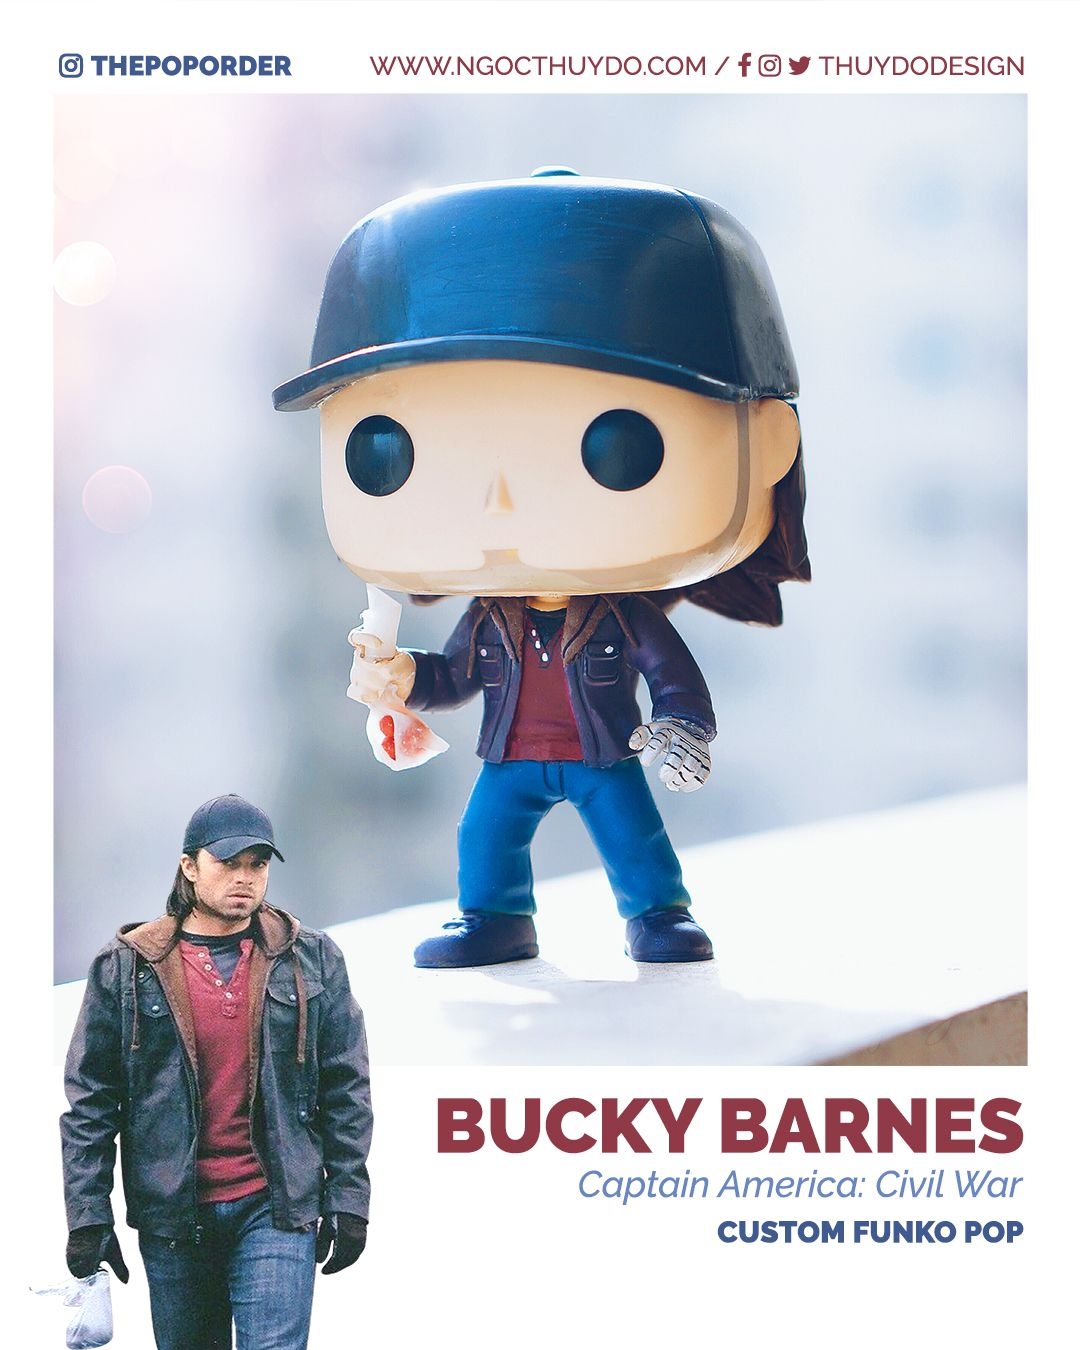 Pin By Kathryn Redd On Marvel In 2020 Custom Pop Figures Marvel Pop Vinyl Bucky